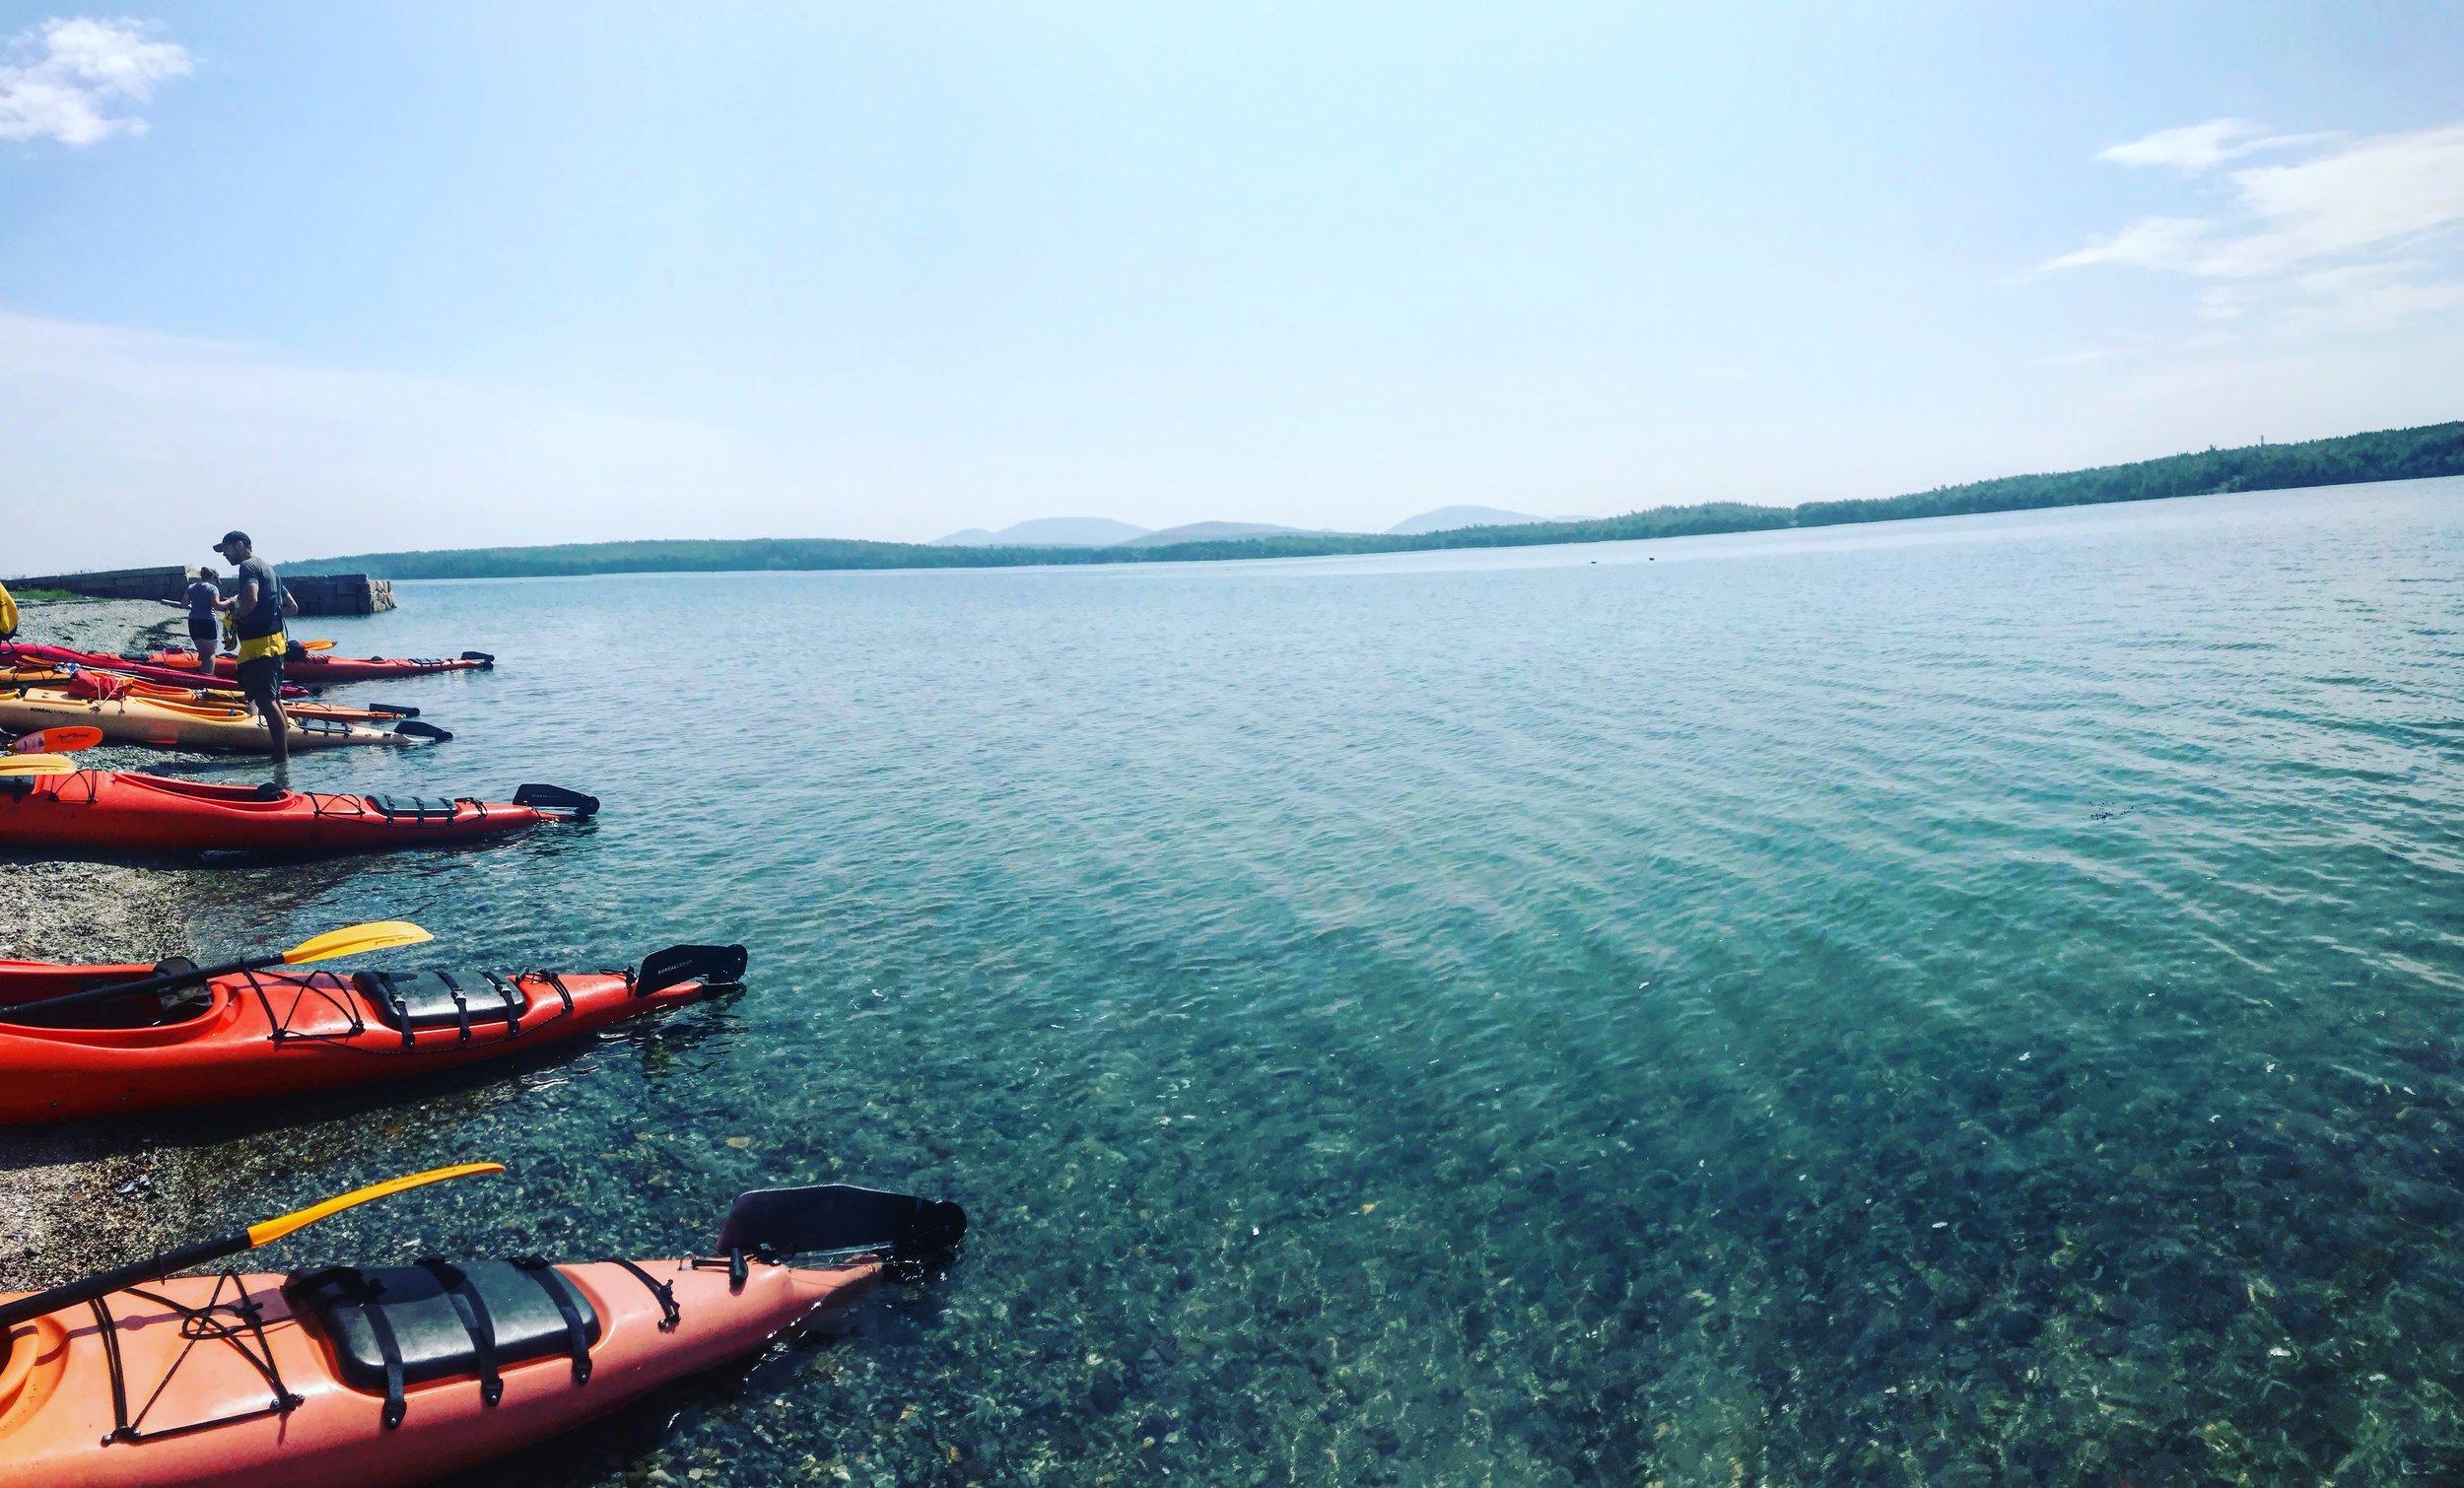 Before the adventure of Sea Kayaking!